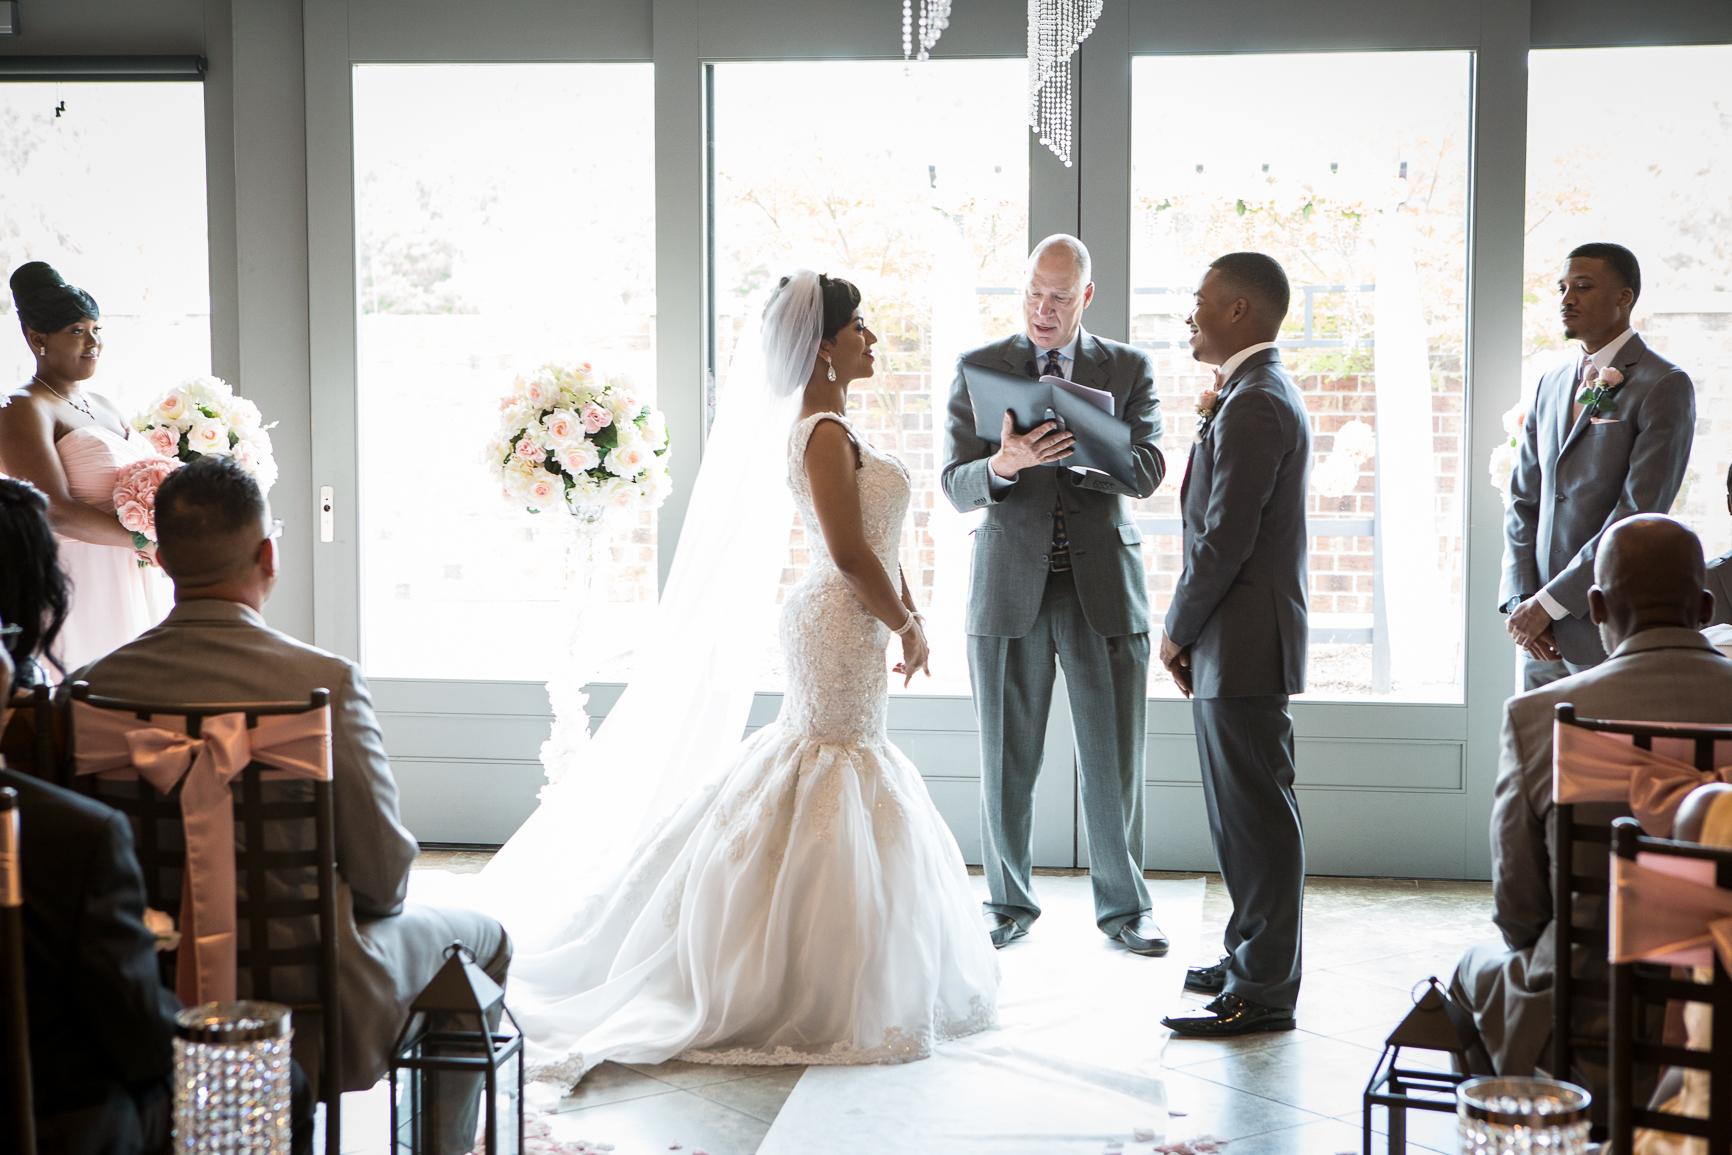 Noah's Morrisville wedding venue photographer - 101 studio llc -15.jpg